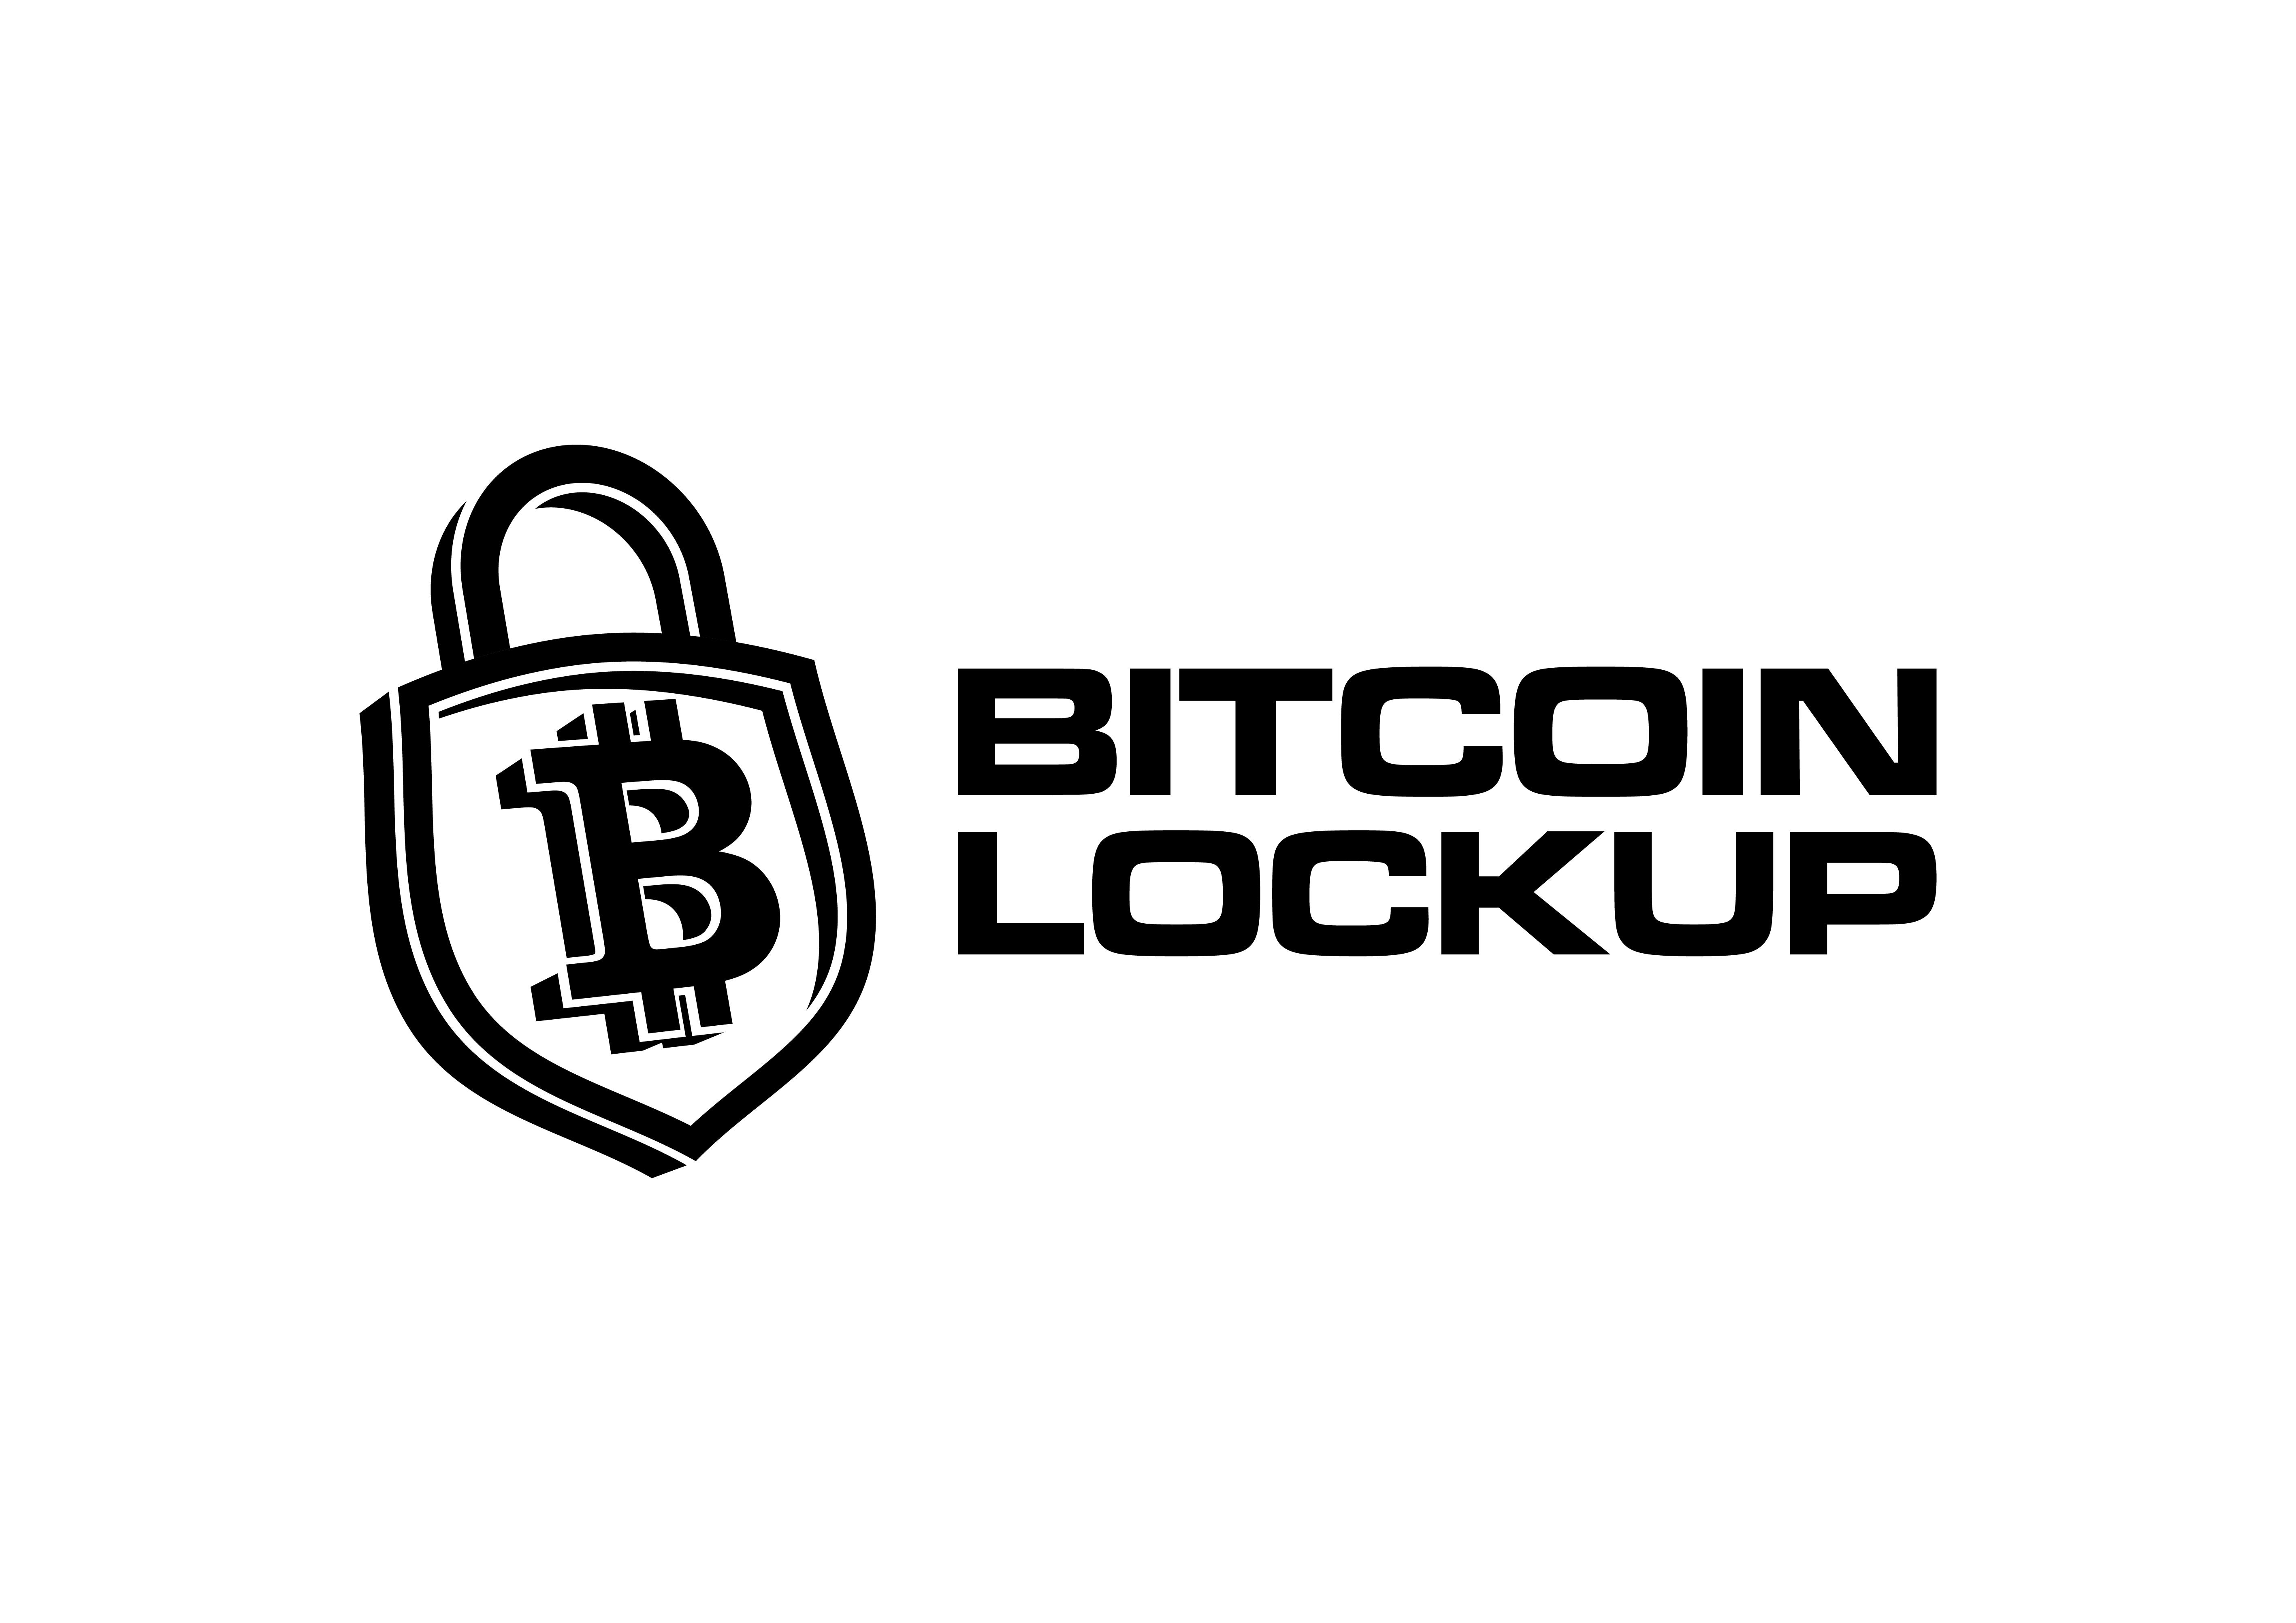 Bitcoin Lockup